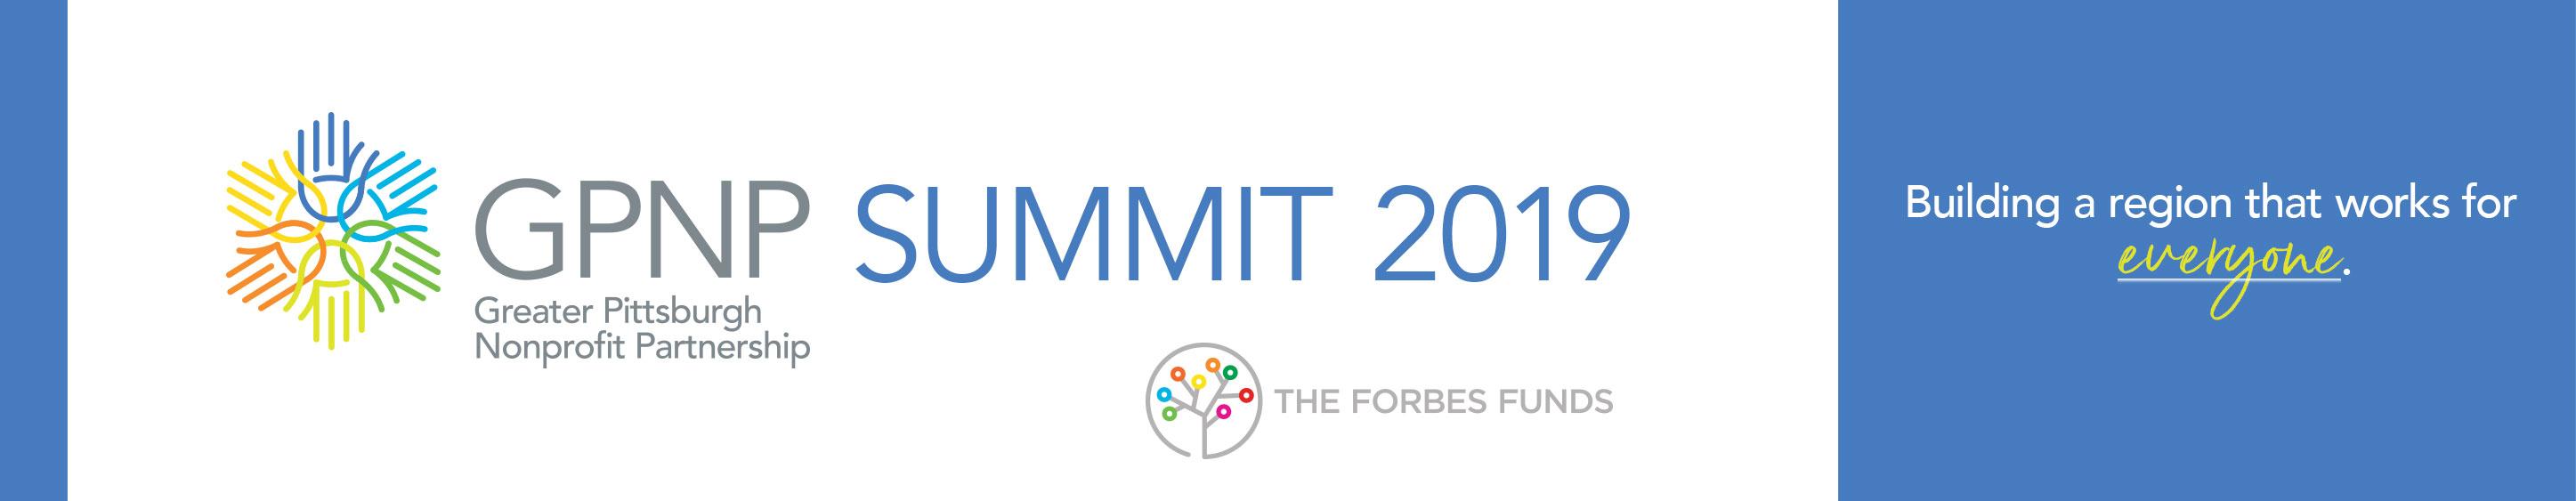 GPNP Summit 2019